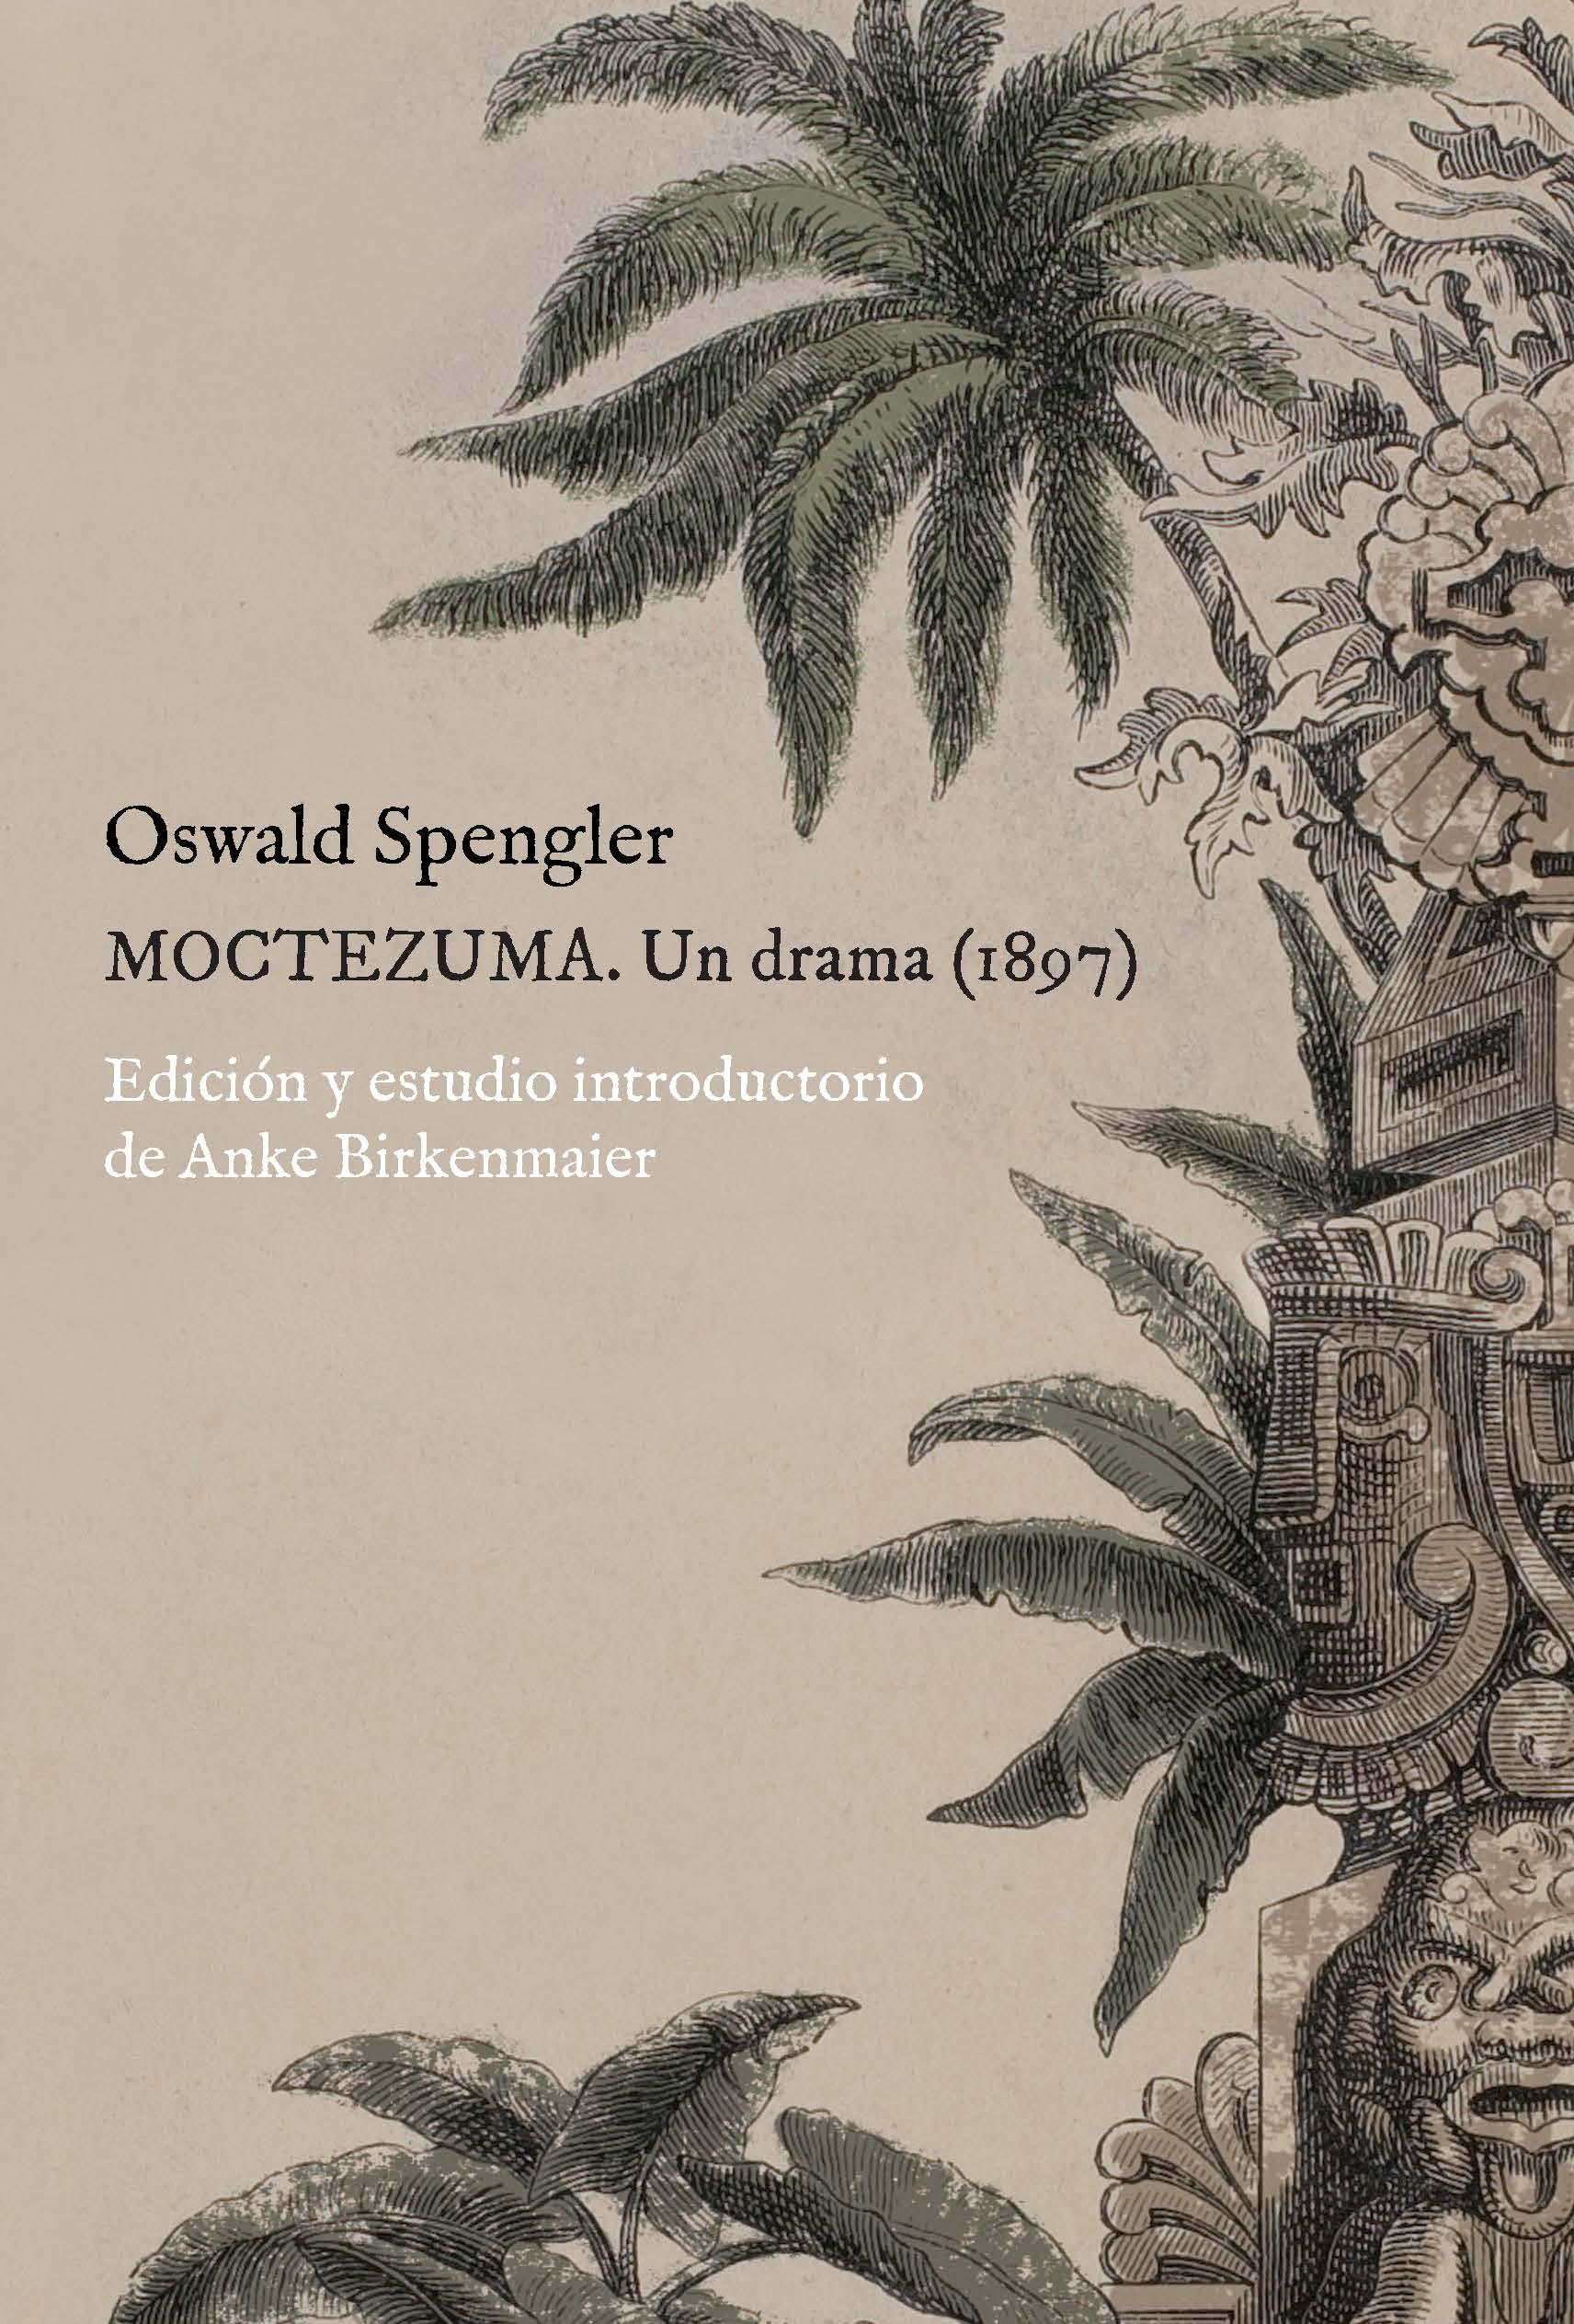 MOCTEZUMA UN DRAMA 1897